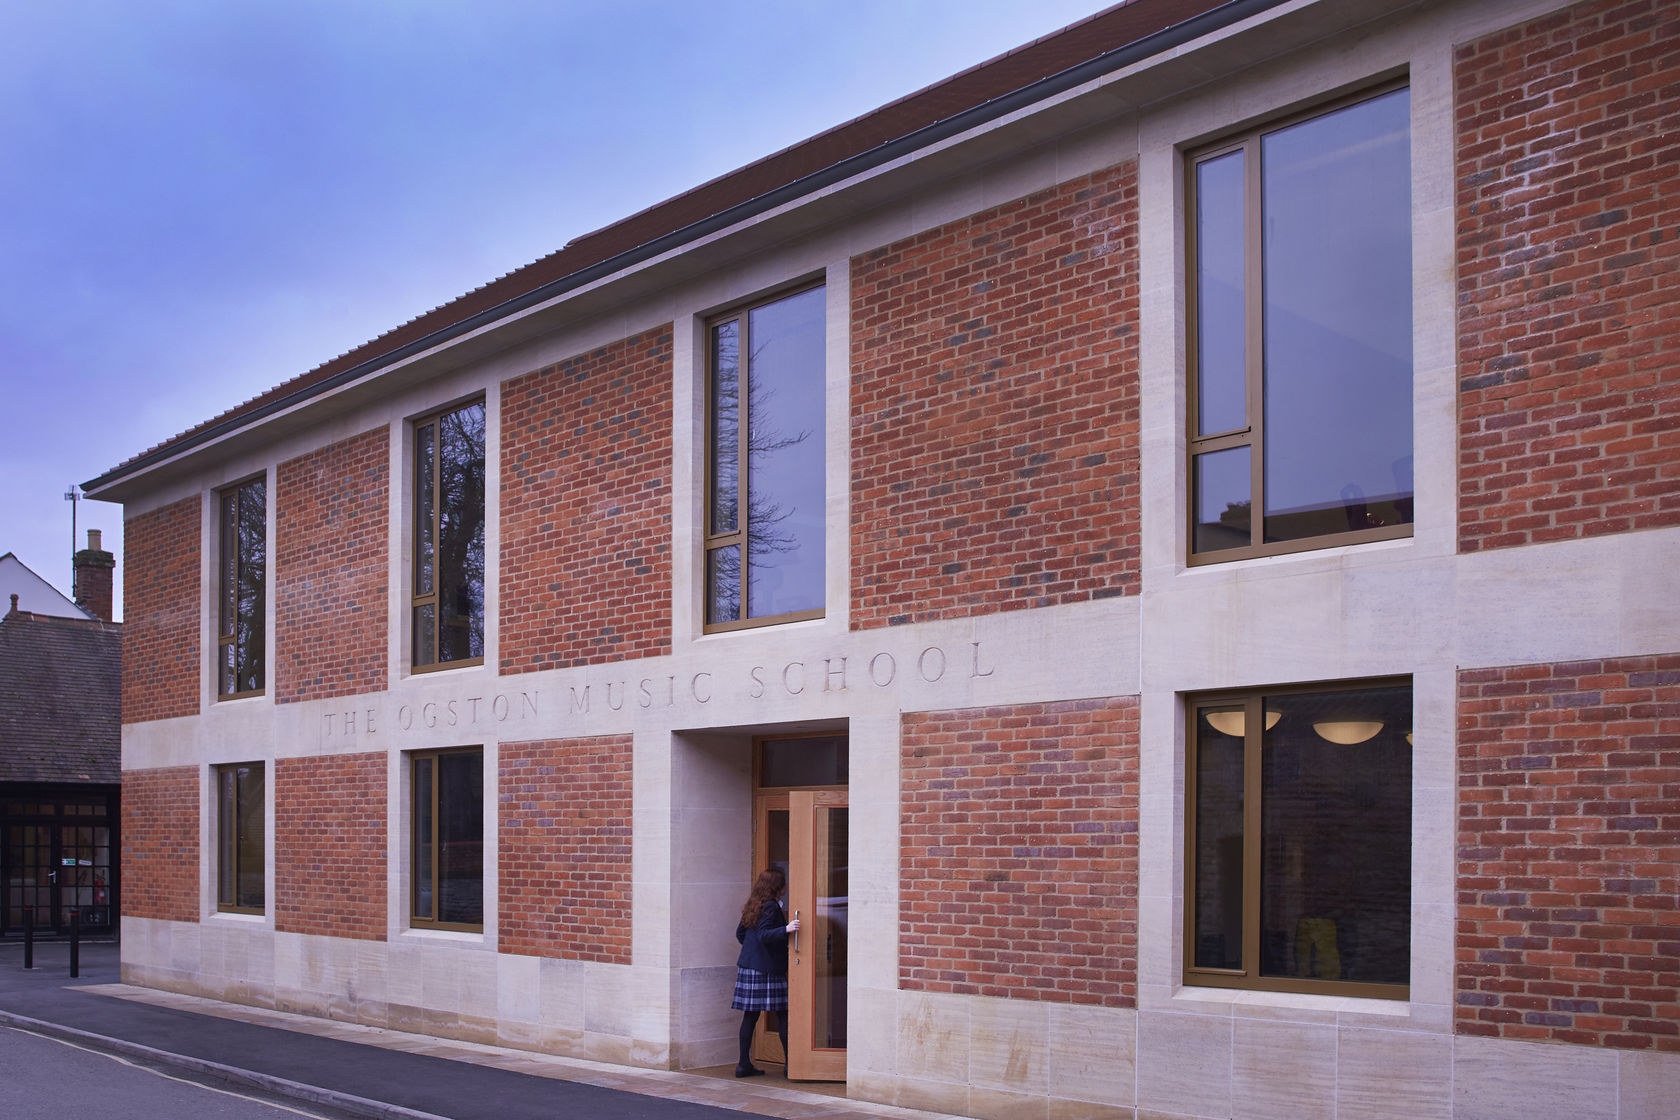 The Ogston Music School Main Gallery Image